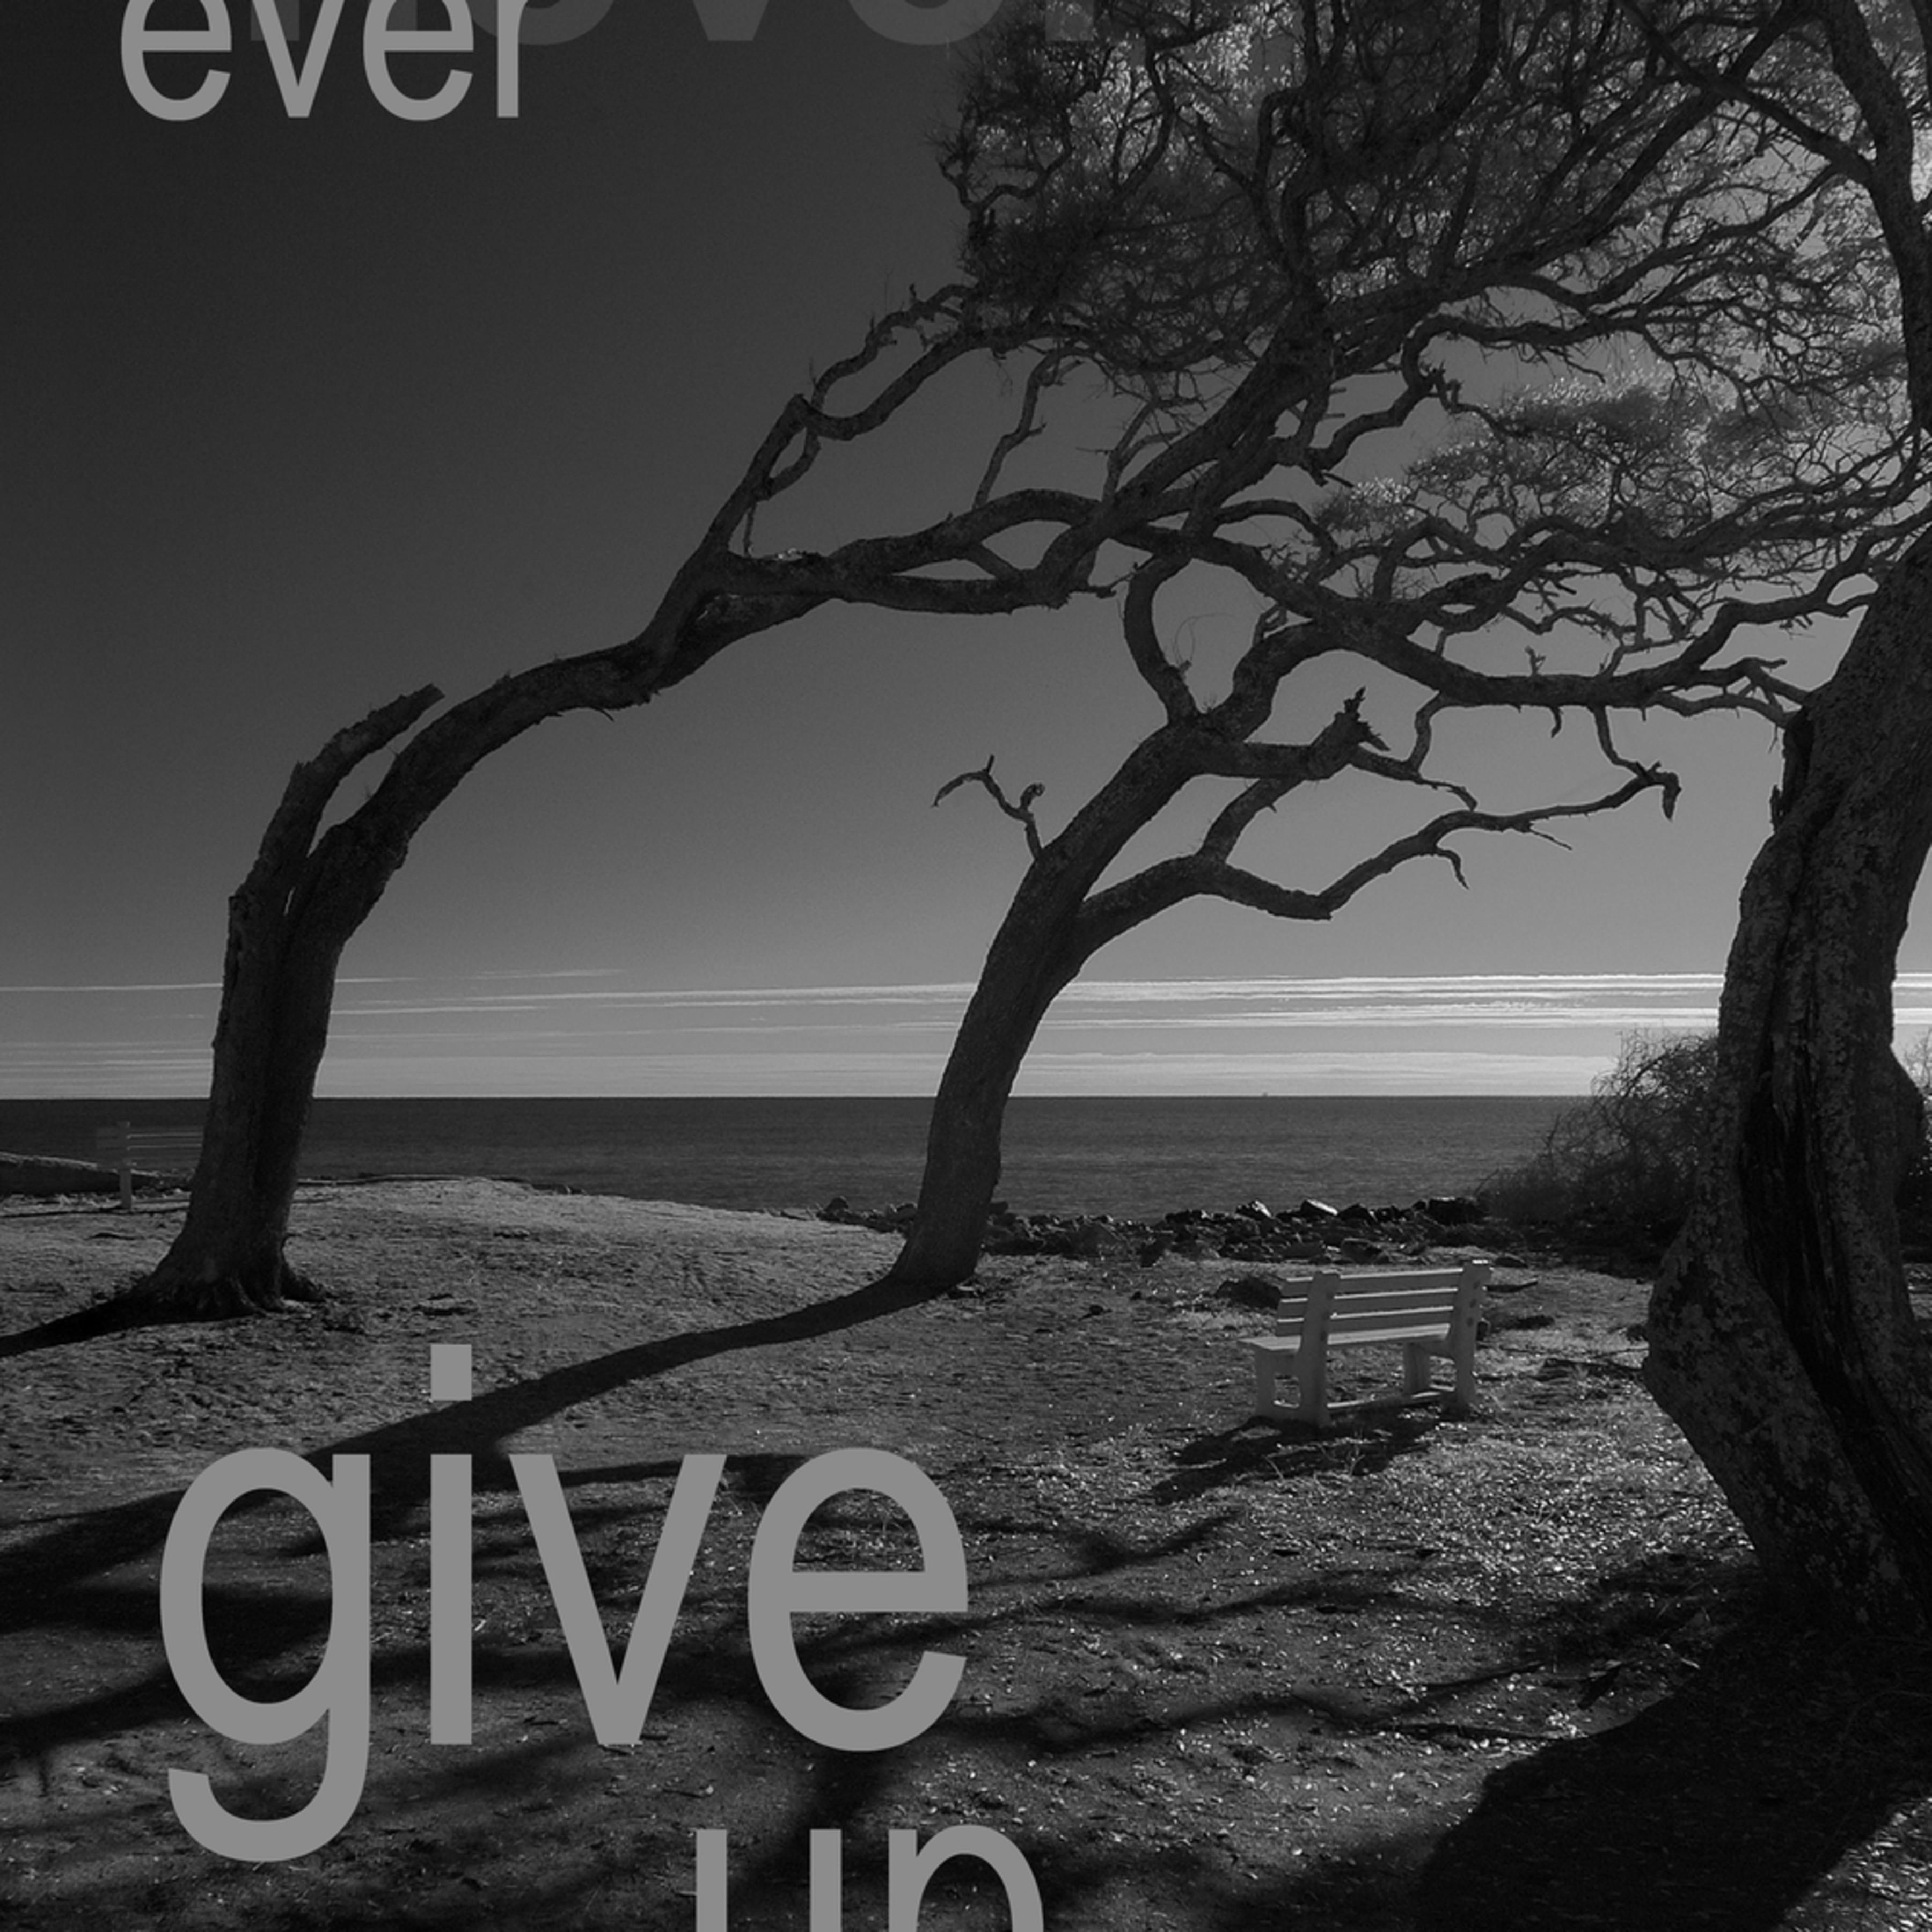 Never give up iiry6u